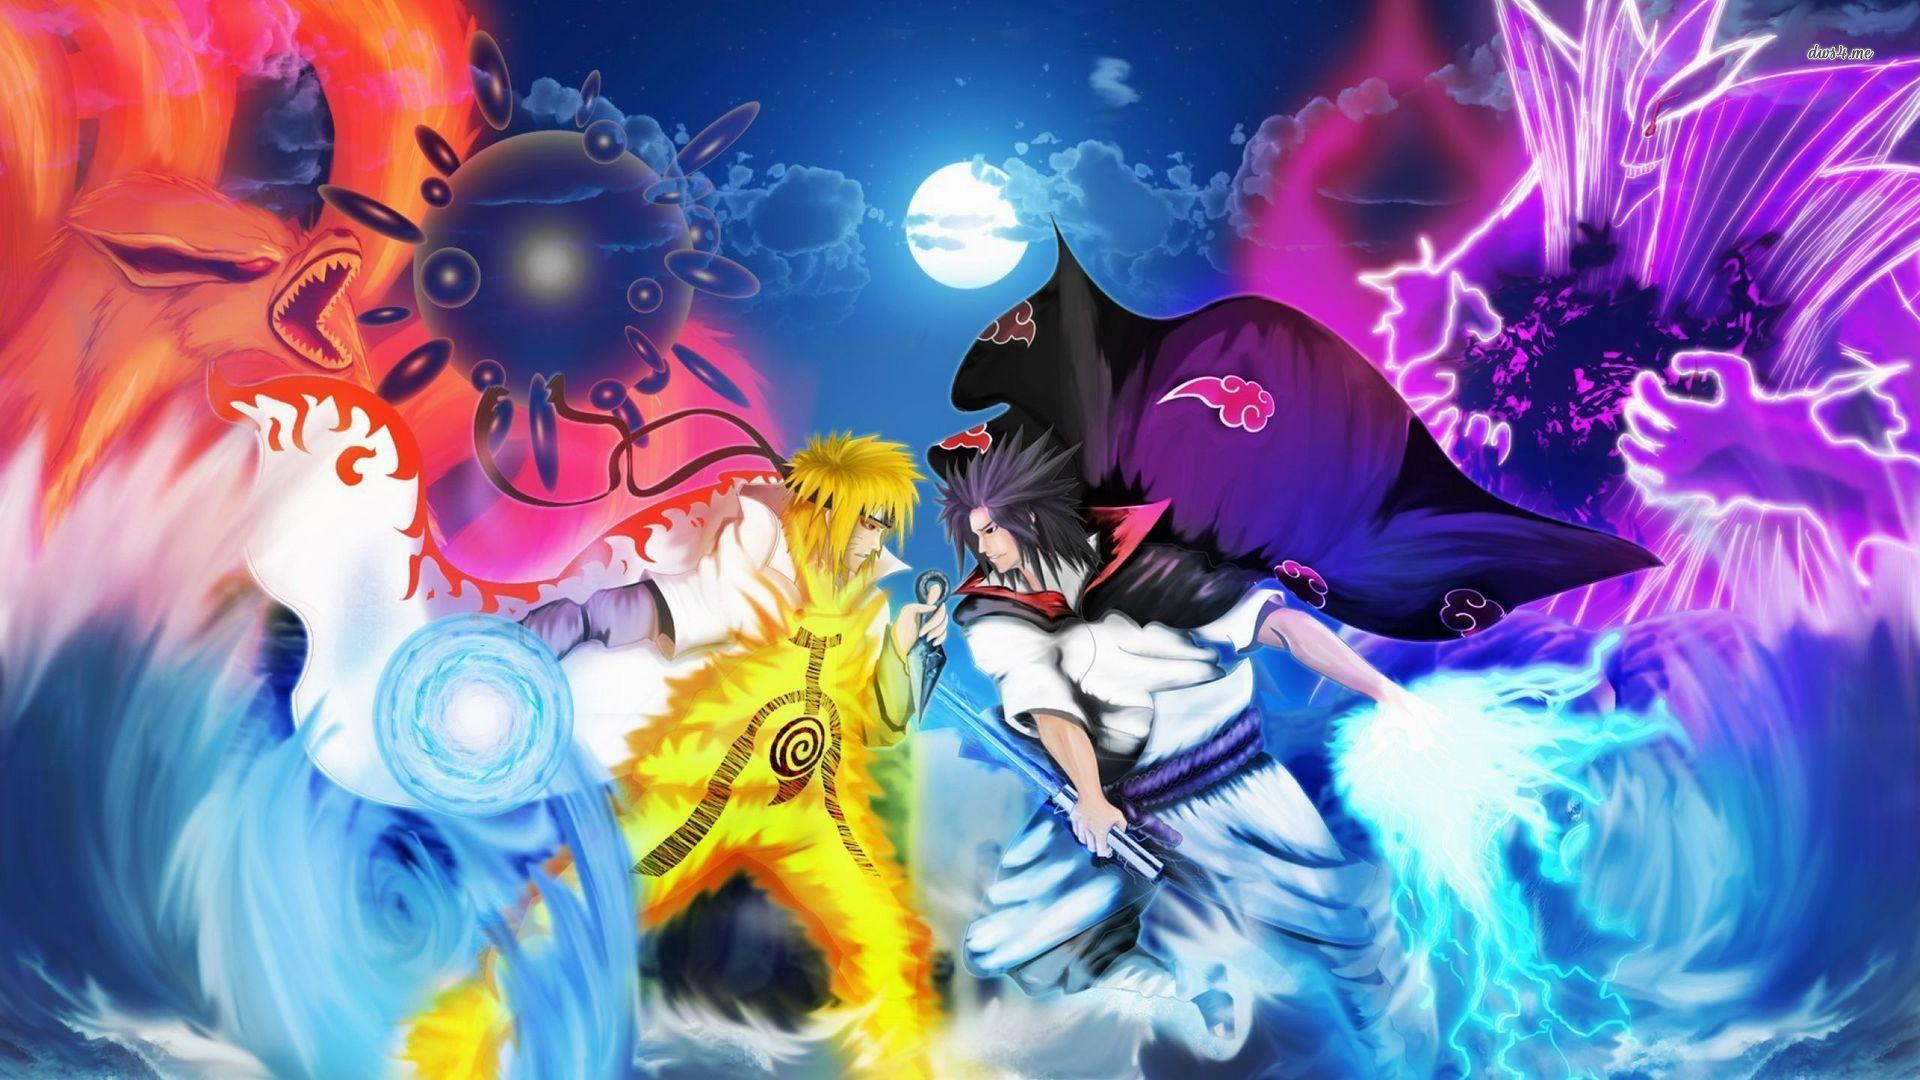 Naruto-Vs-Sasuke-Wallpapers